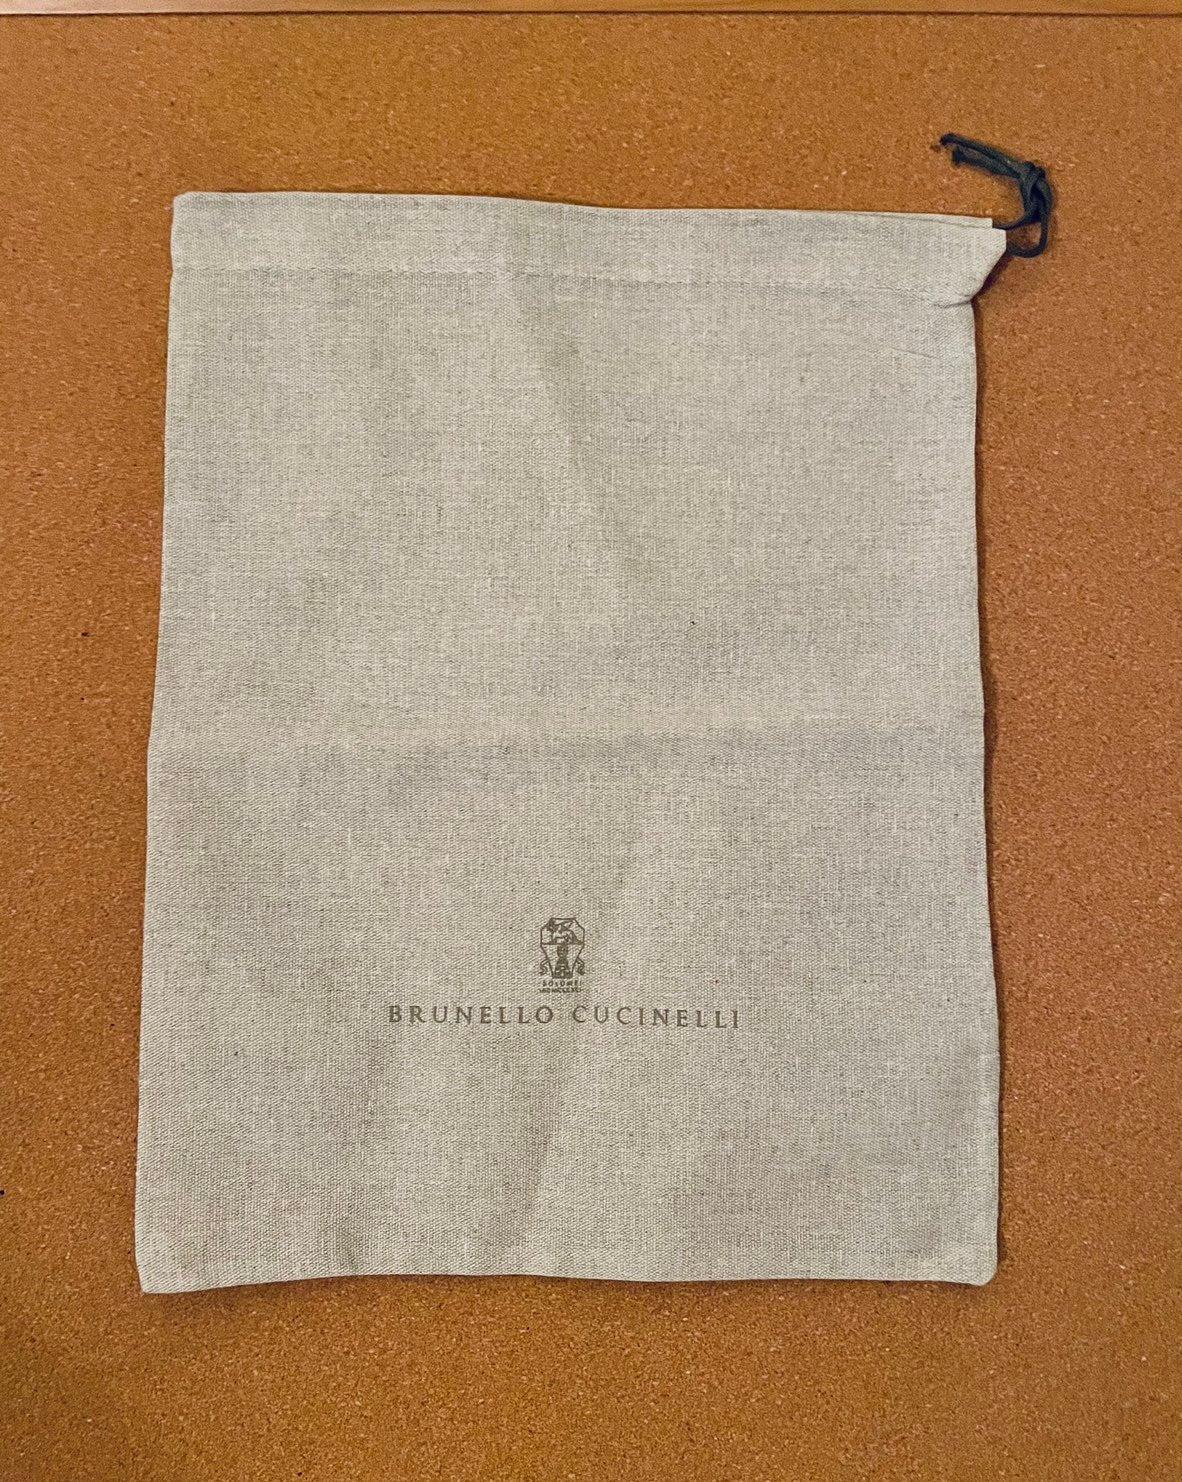 Brunello Cucinelli Bag